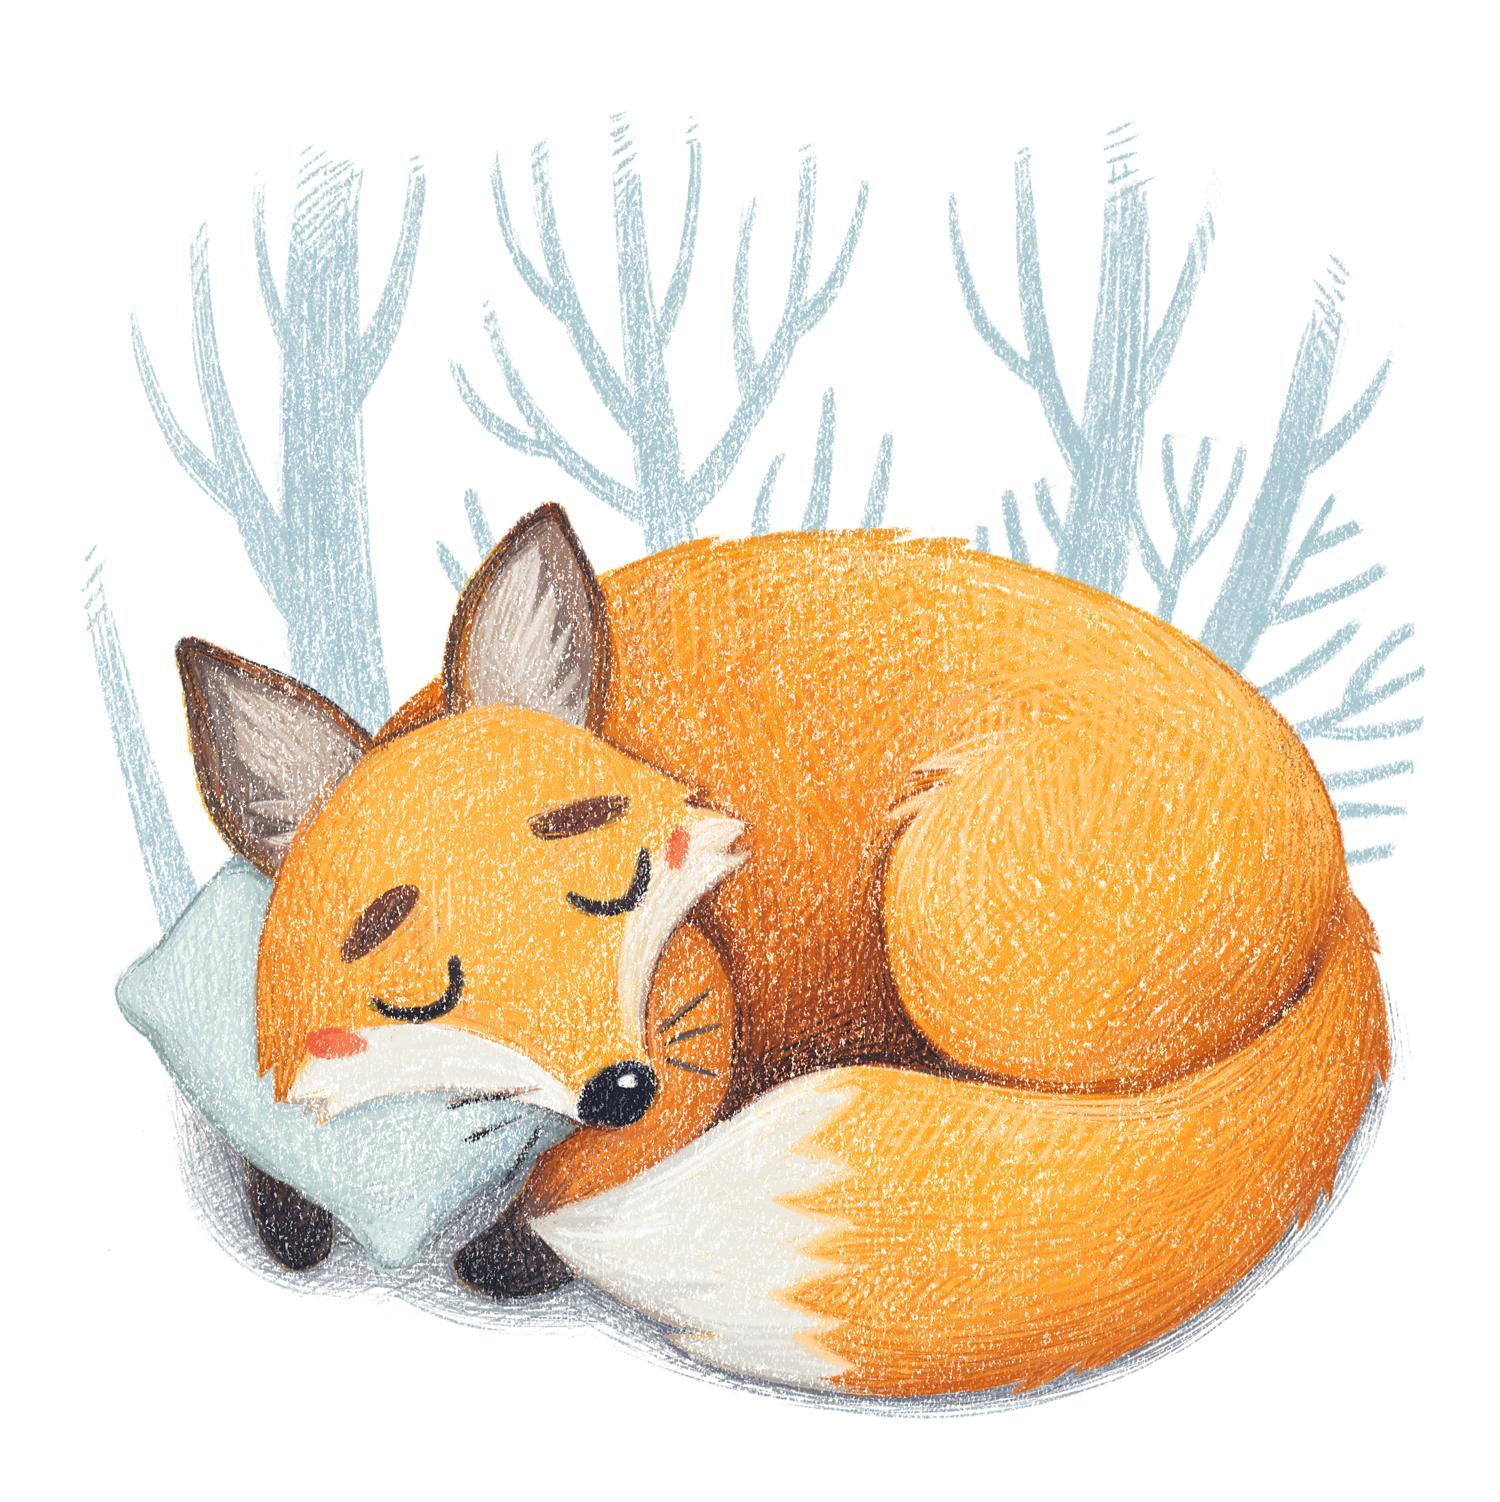 Children's illustration Sleeping Fox by Margarita Levina